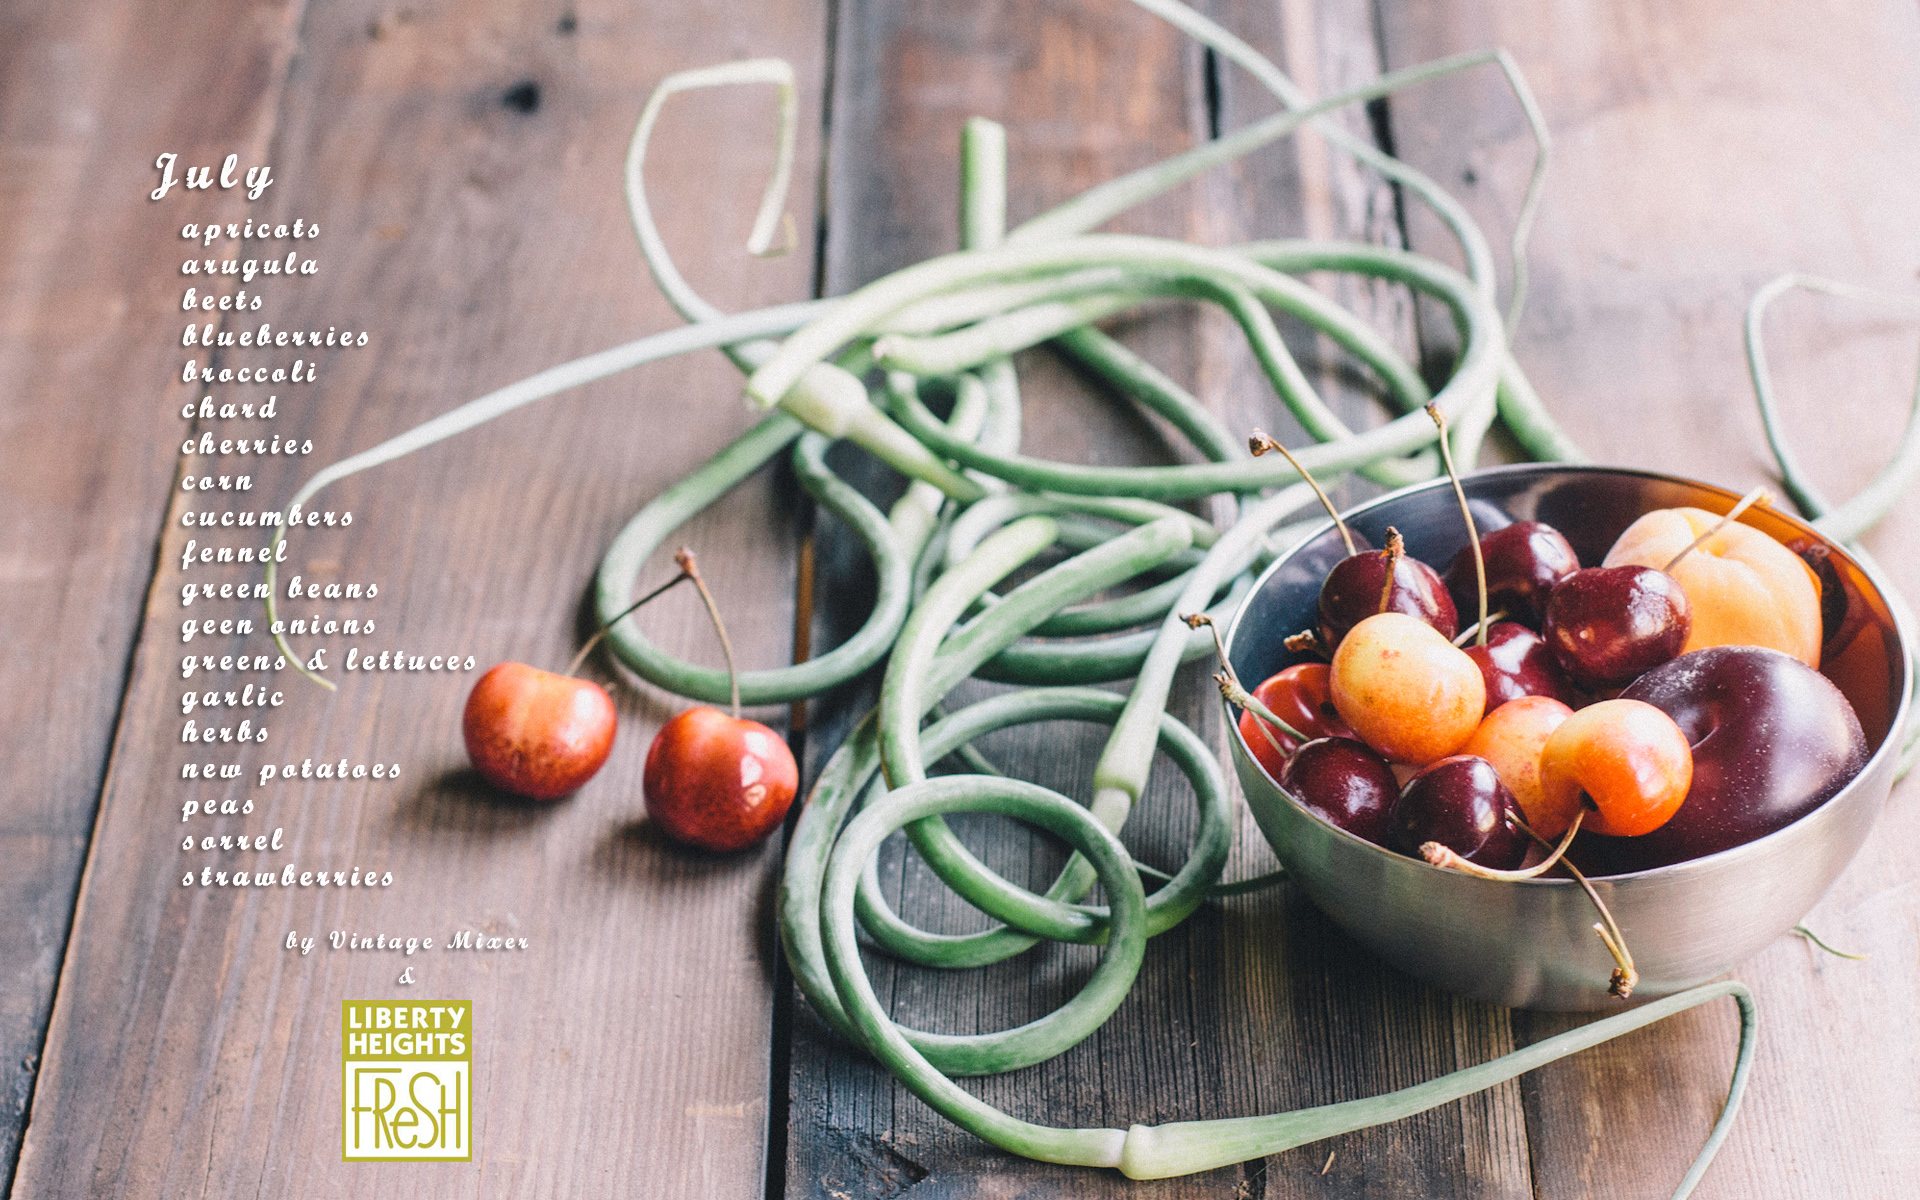 Seasonal Produce Guide for July